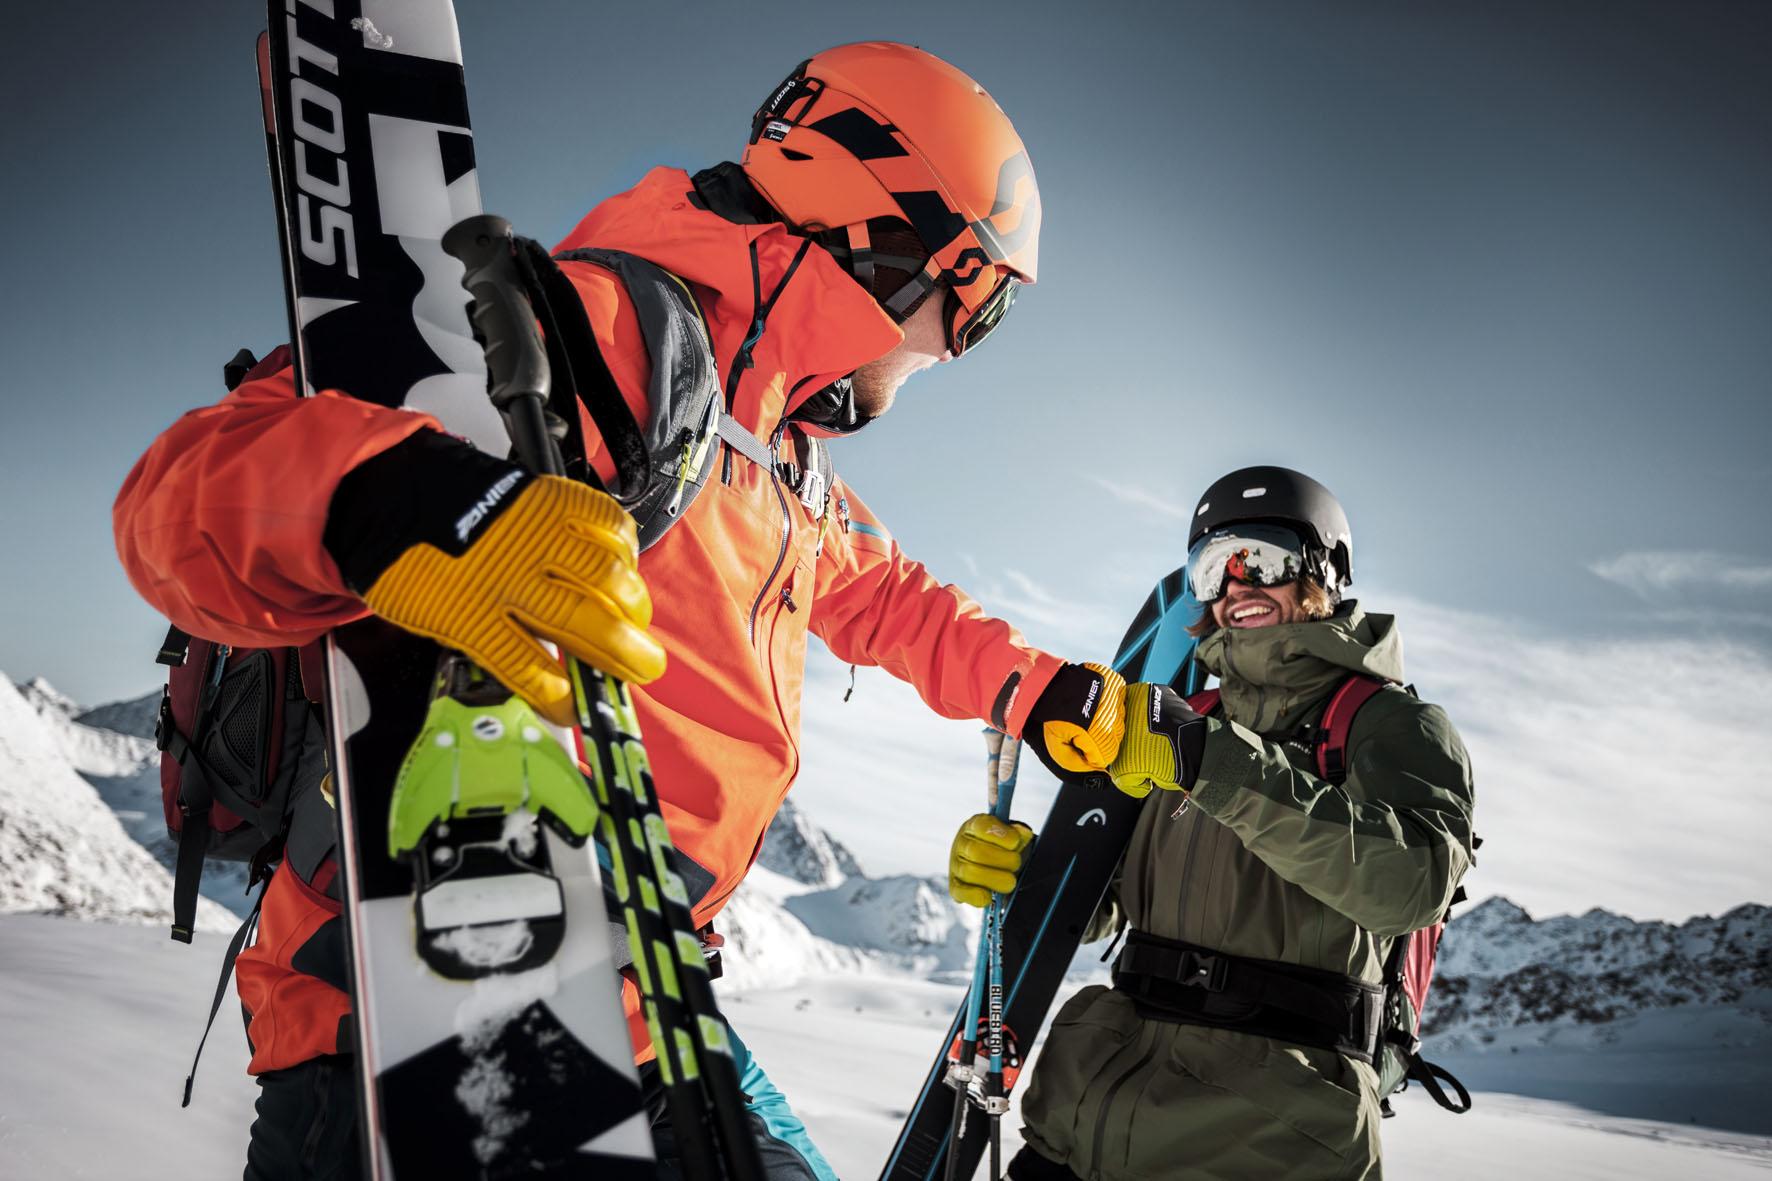 a089db07e51636 ZANIER Backcountry-Handschuhe mit Profis entwickelt